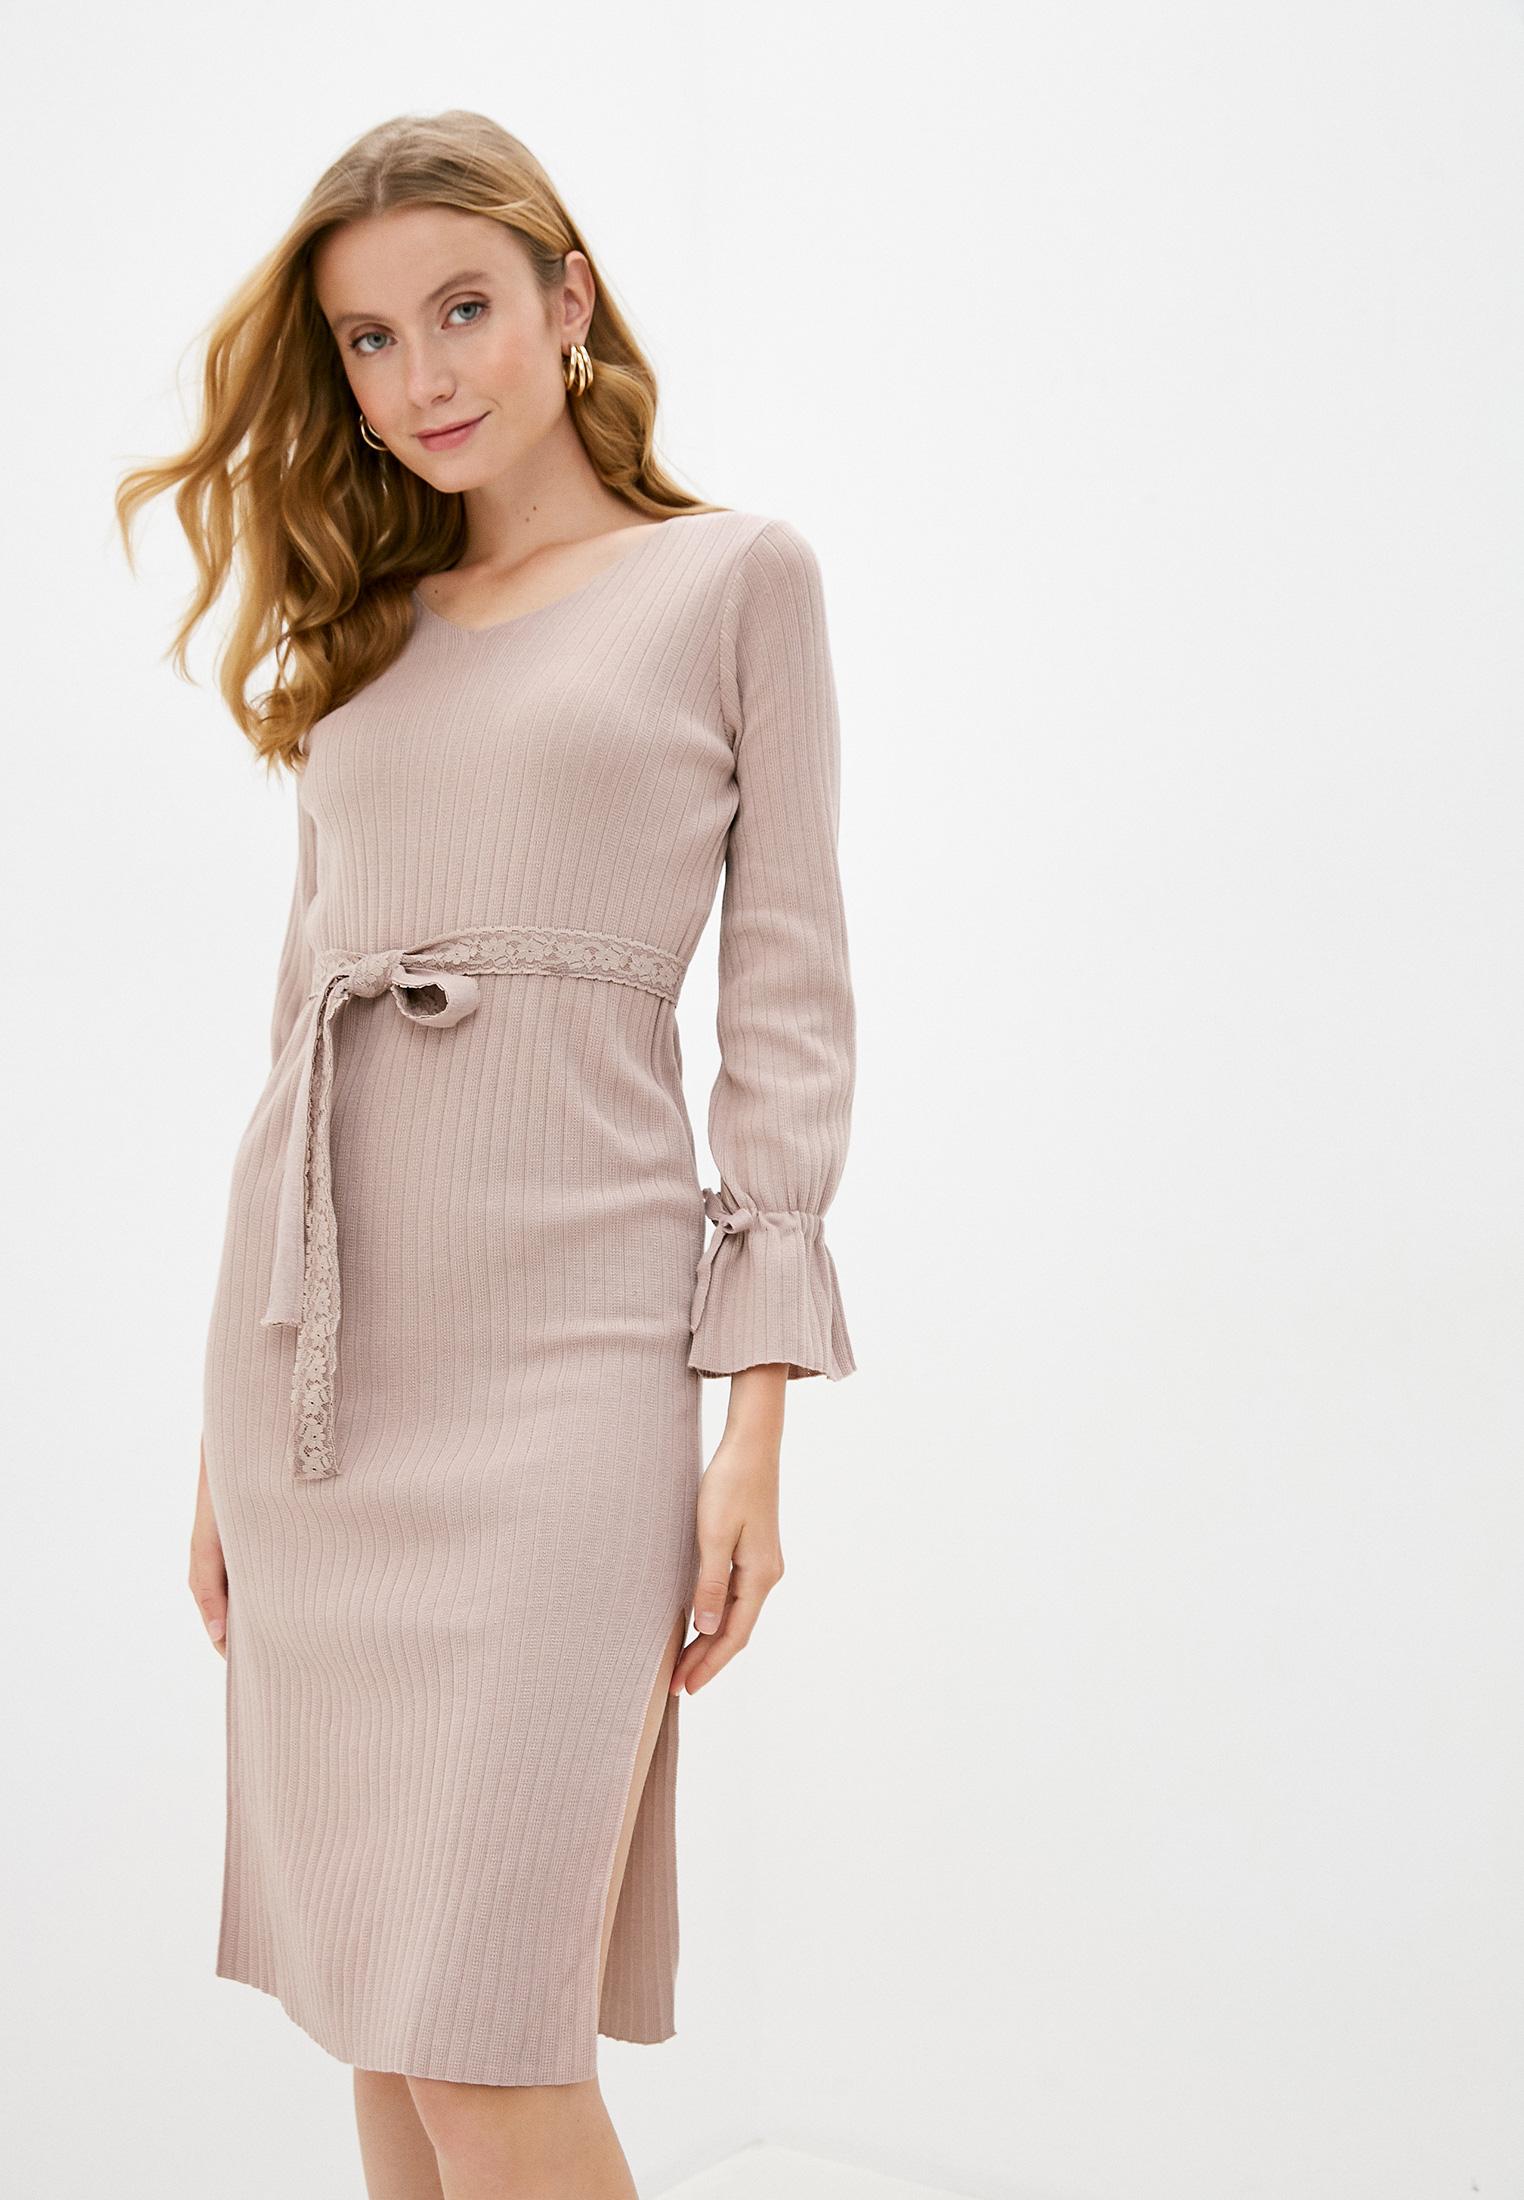 Вязаное платье Miss Gabby 8136